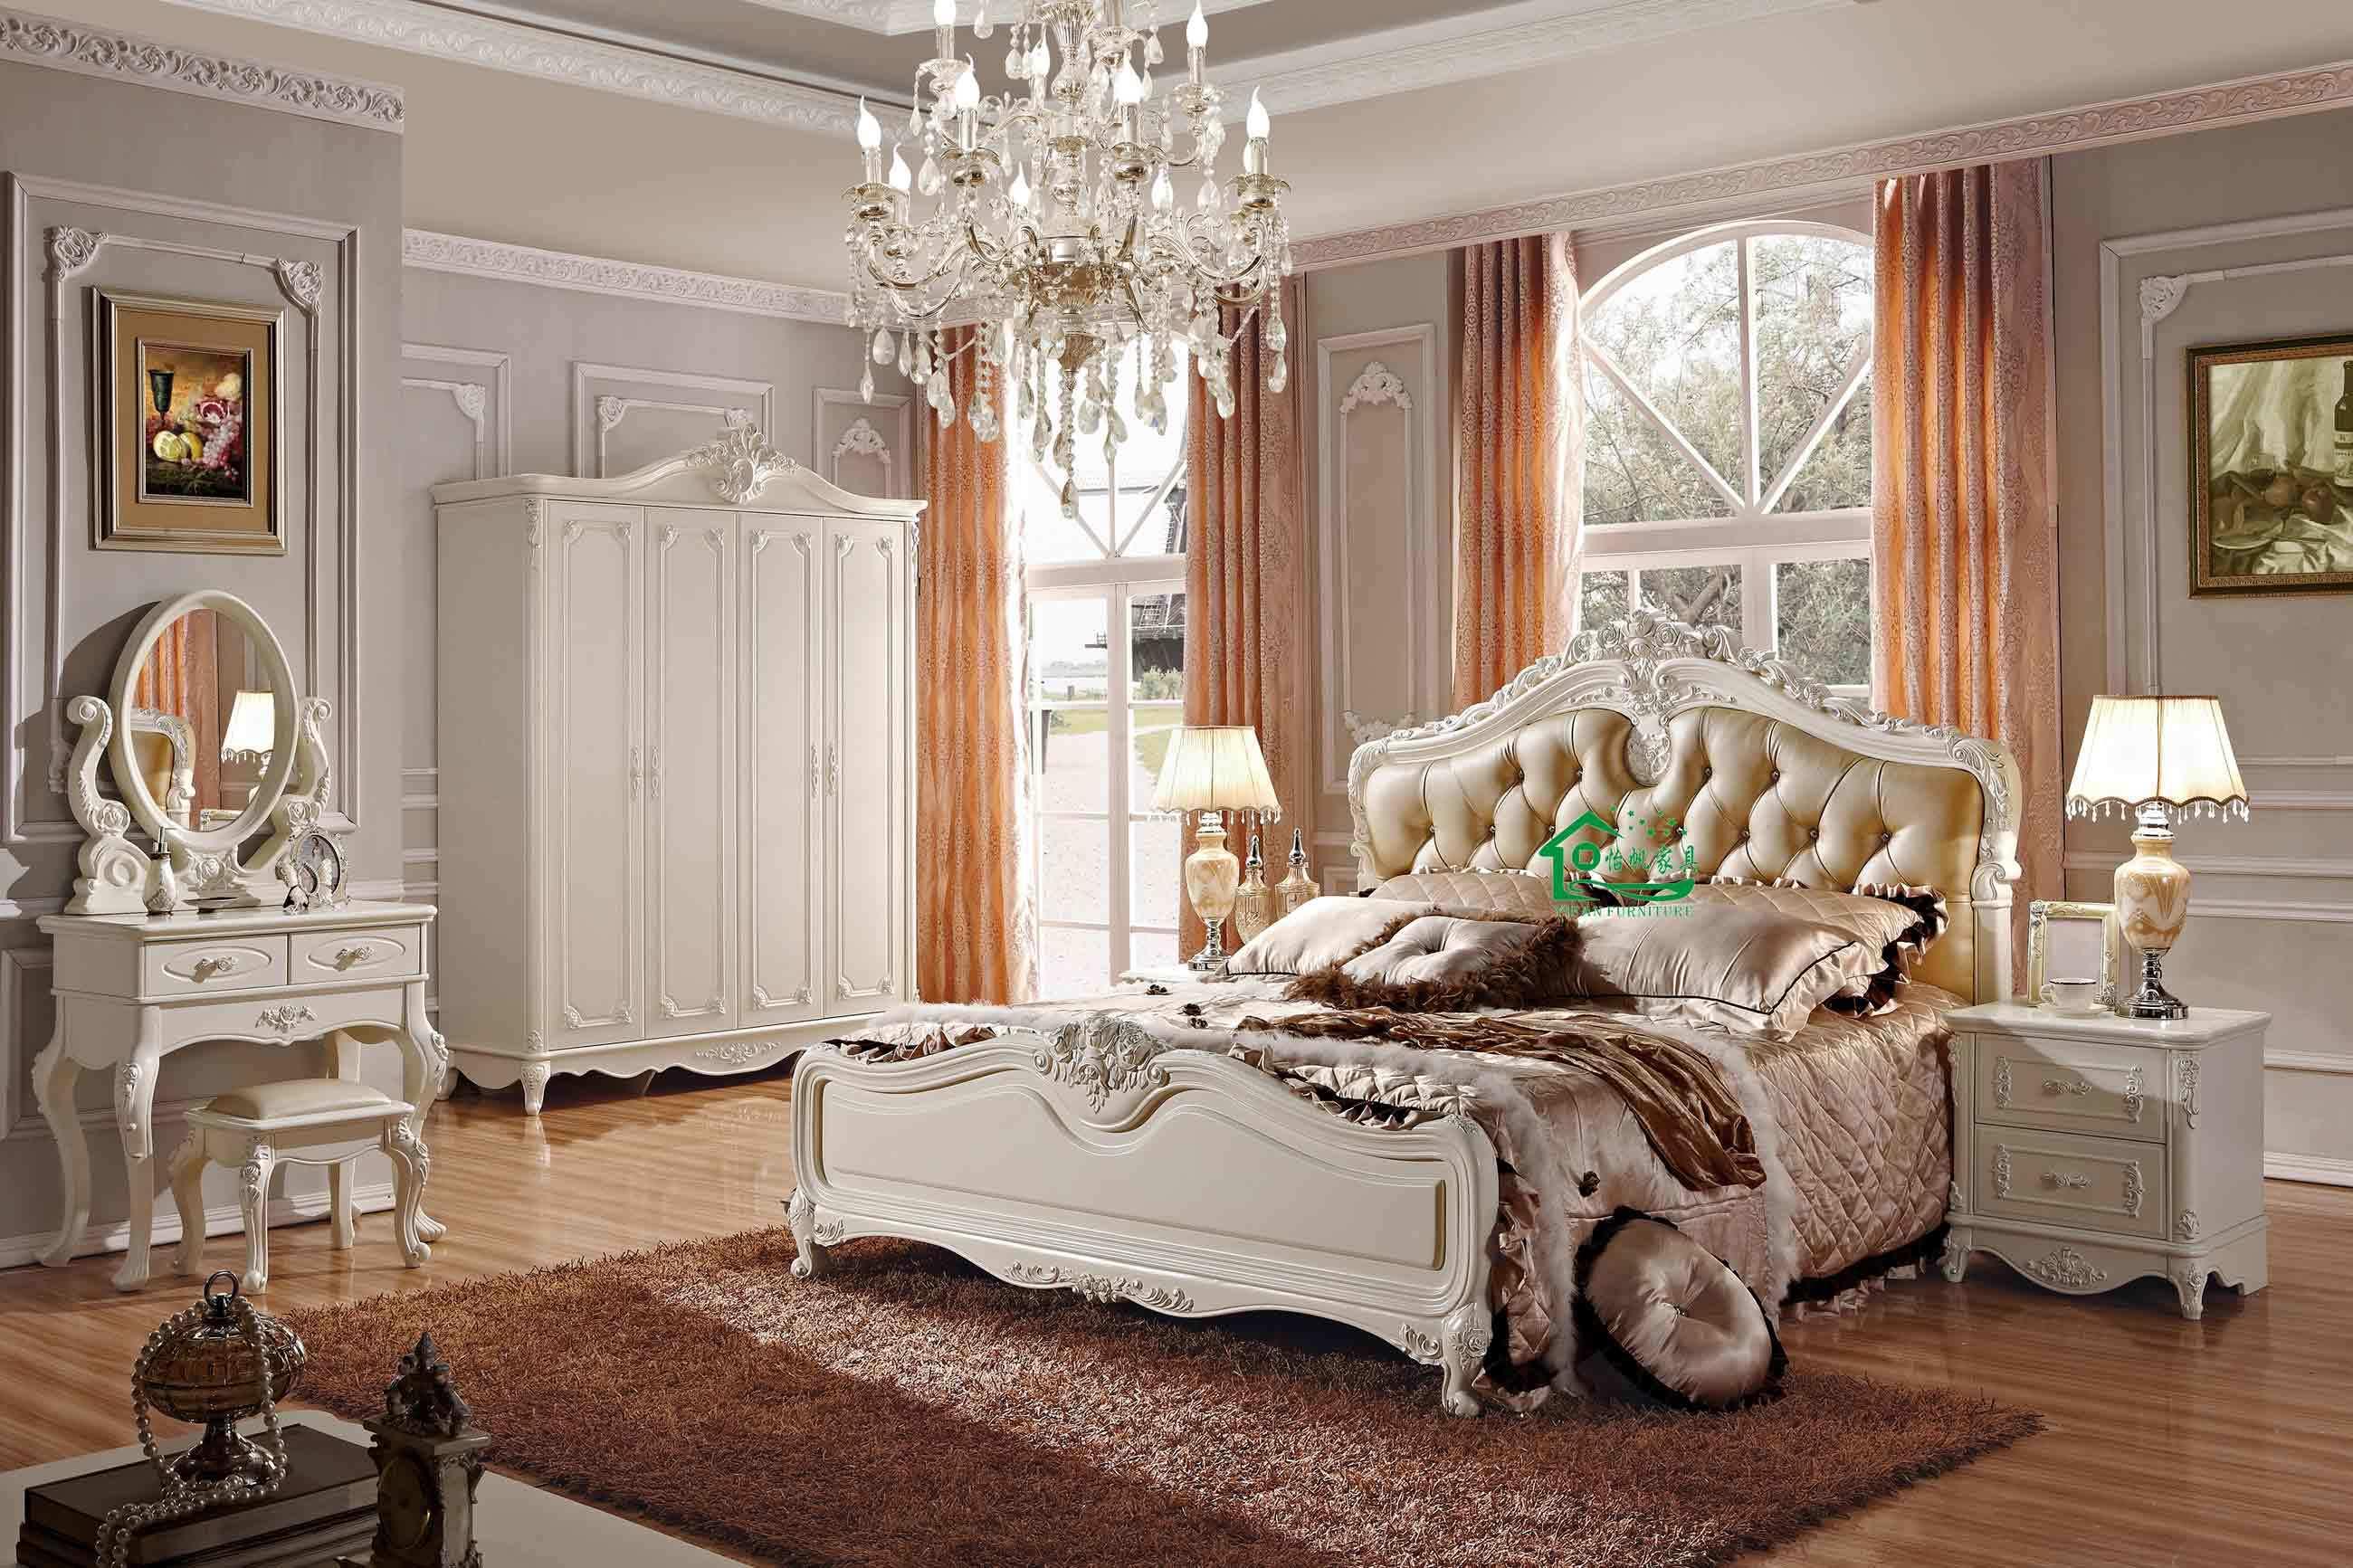 Emejing Chambre A Coucher Modele Turque Ideas - Matkin.info ...